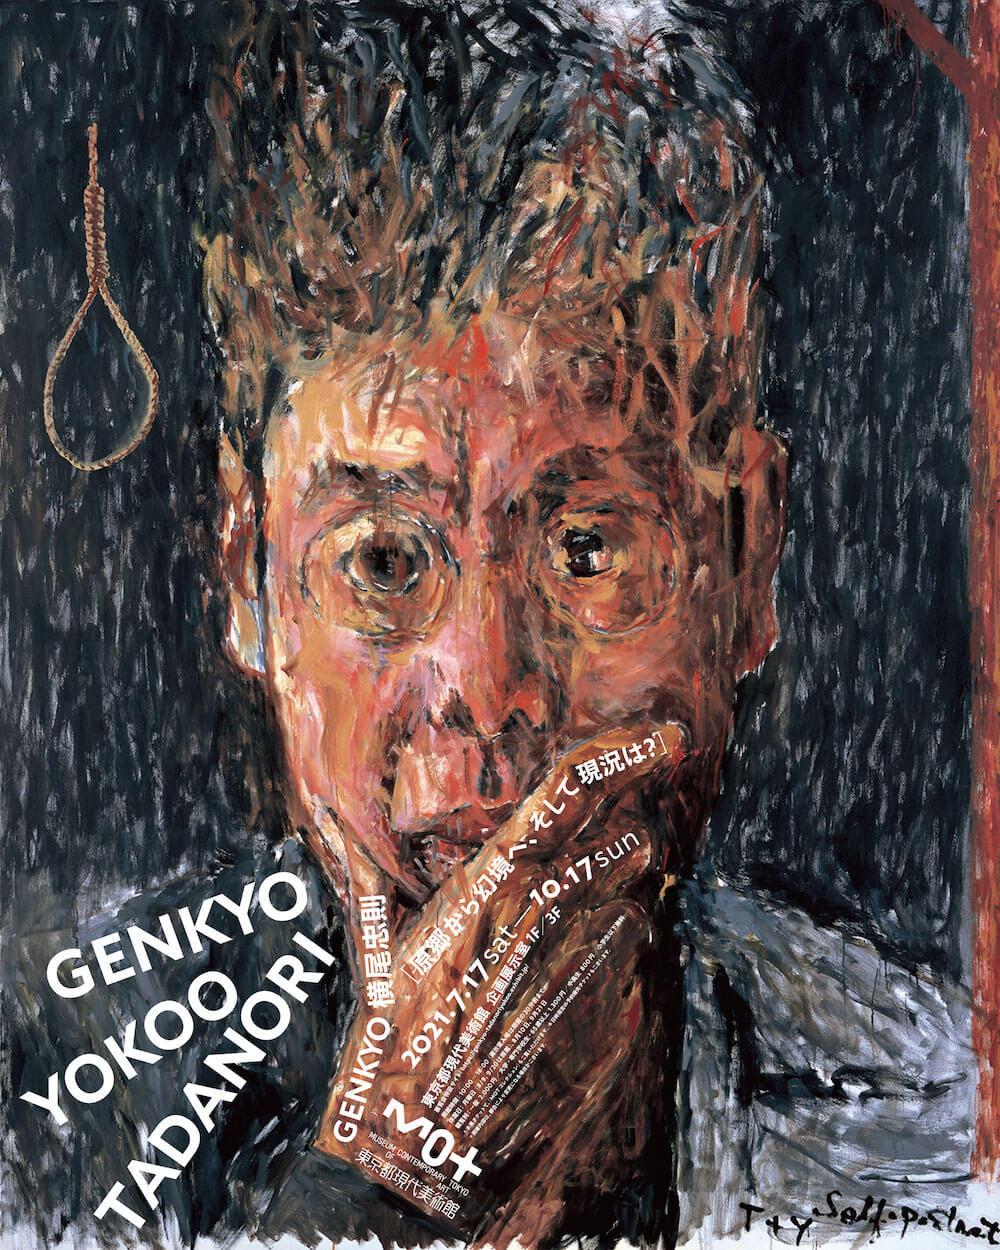 「GENKYO 横尾忠則 原郷から幻境へ、そして現況は?」東京展メインビジュアル